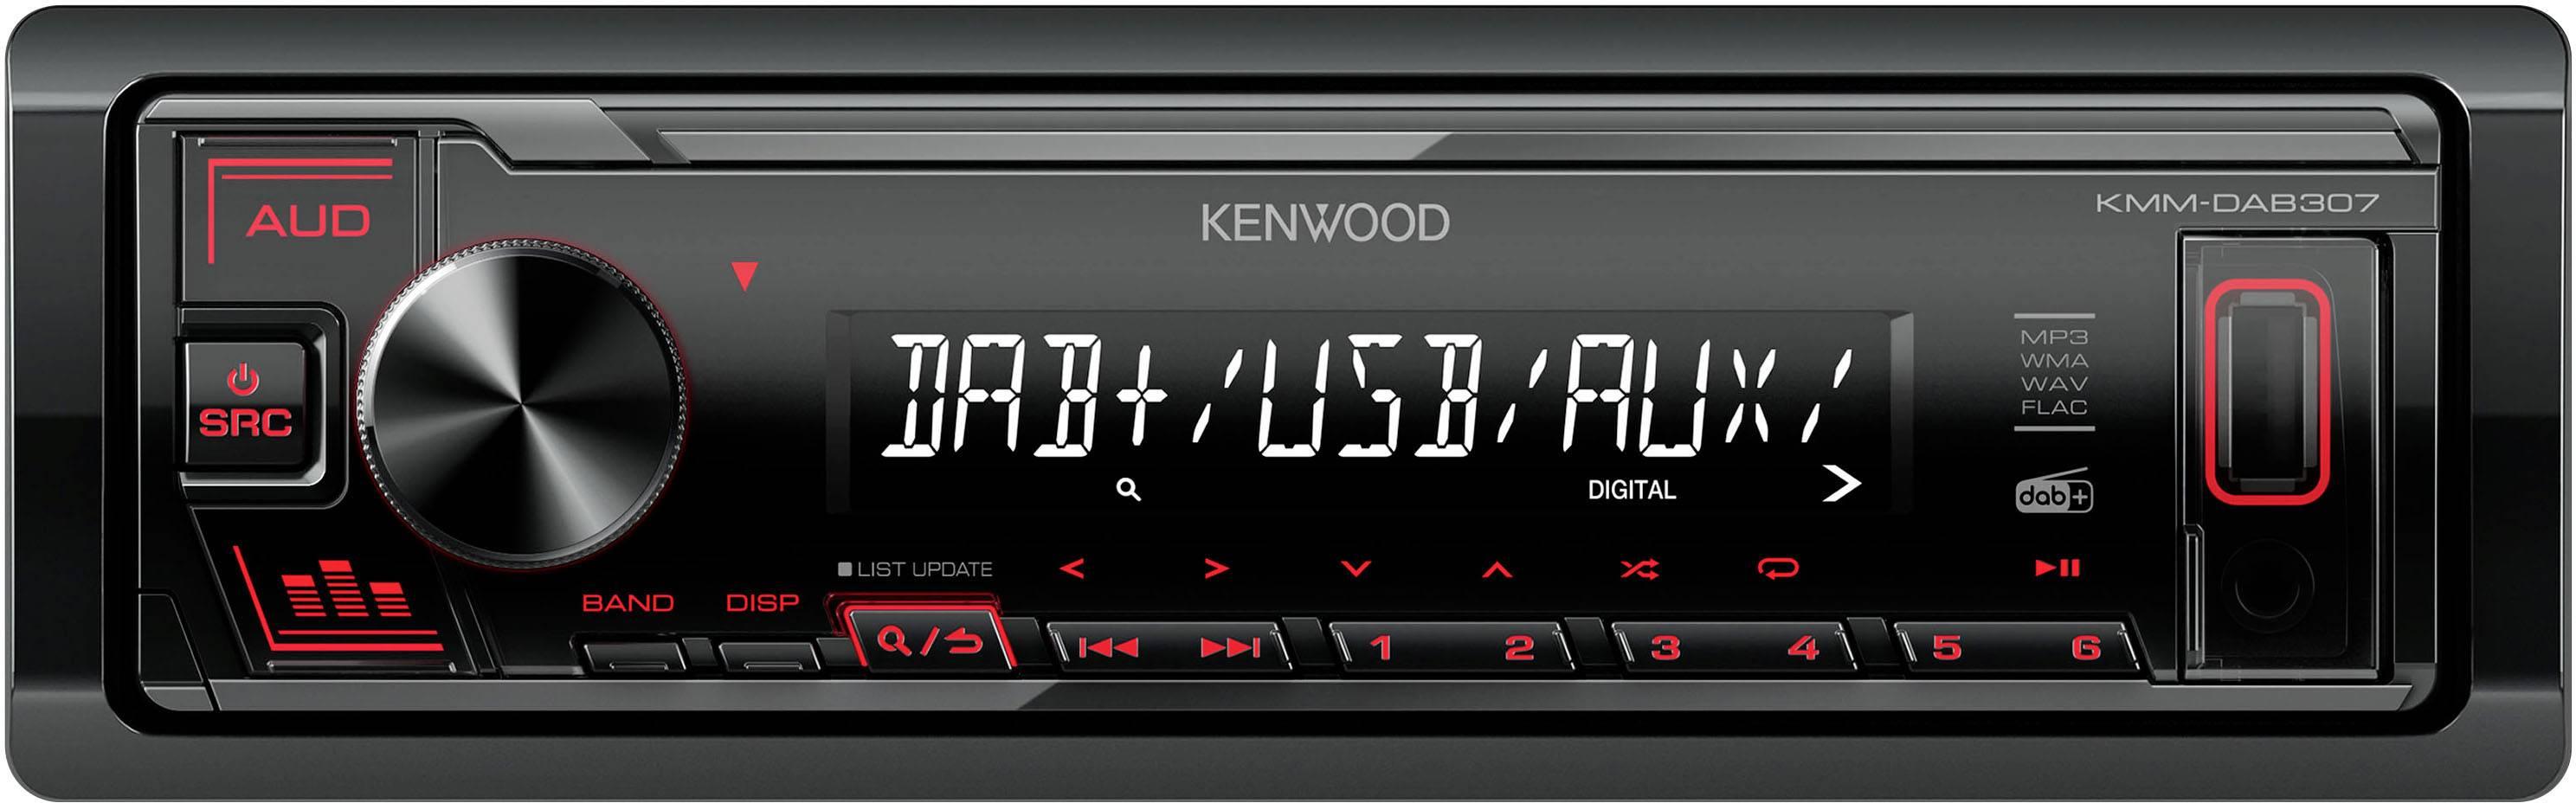 Conrad-Kenwood KMMDAB307 Autoradio enkel DIN DAB+ tuner-aanbieding